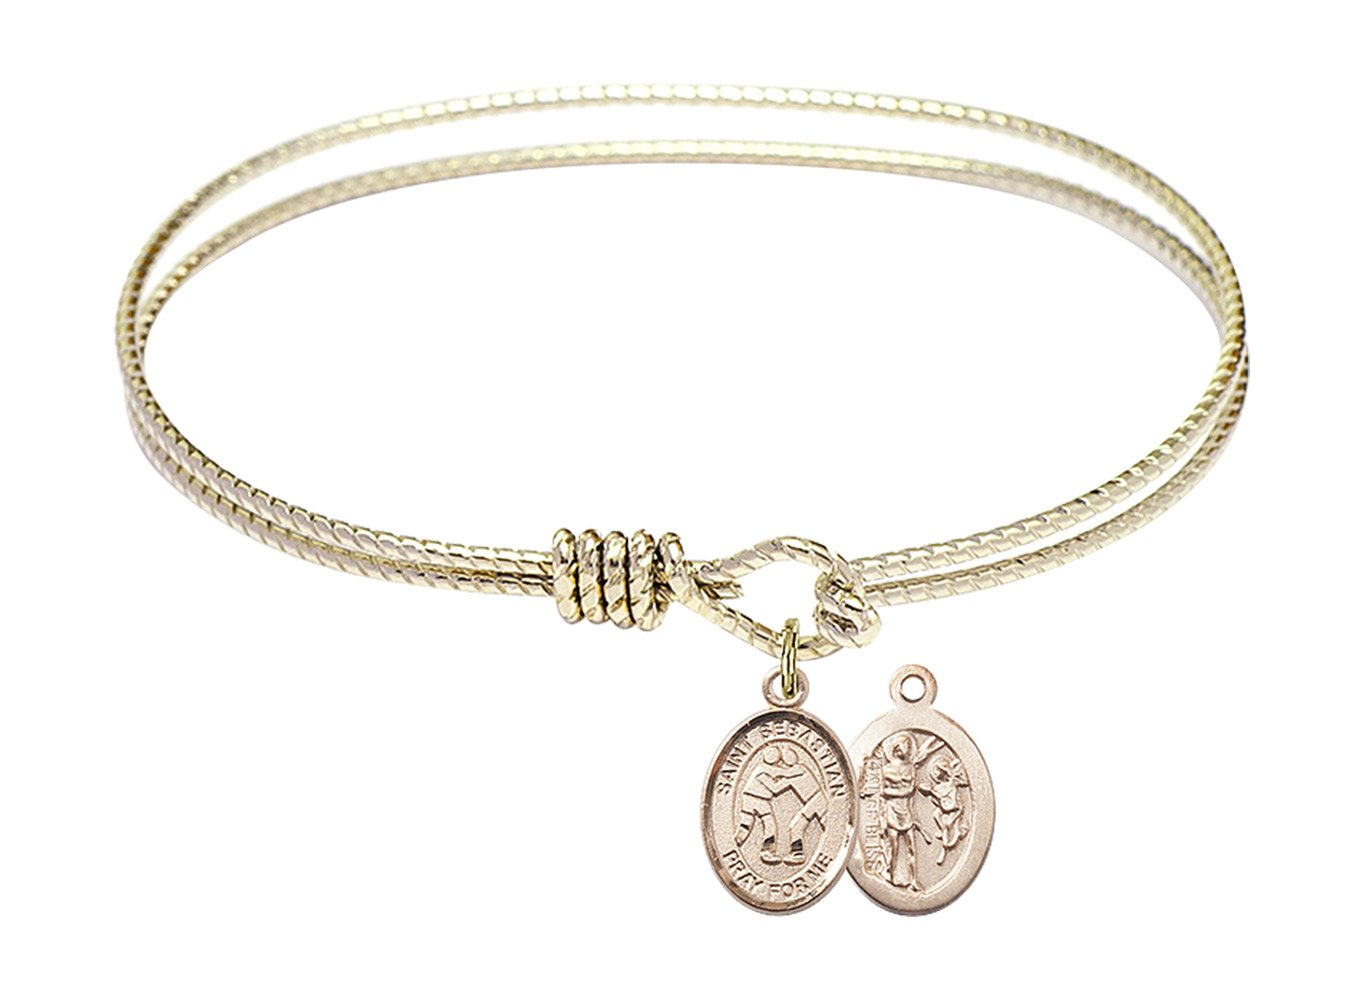 7 1/4 inch Oval Eye Hook Bangle Bracelet with a St. Sebastian/Wrestling charm.